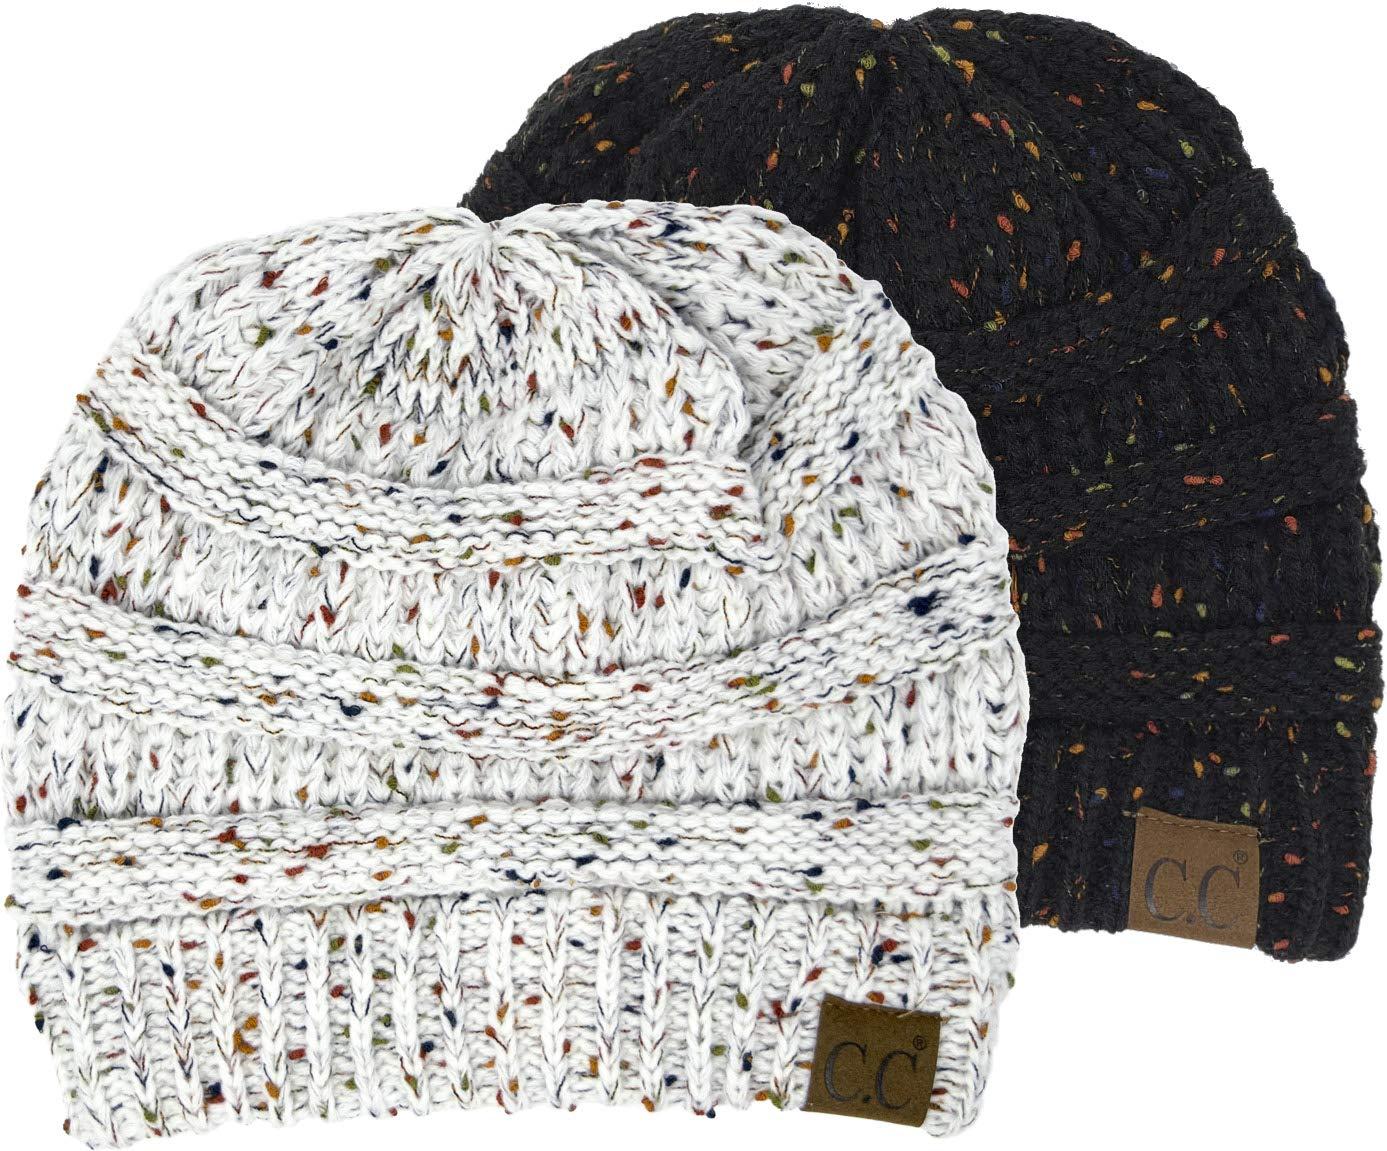 H-6033-2-0625 Confetti Knit Beanie Bundle - 1 Black, 1 Ivory (2 Pack)